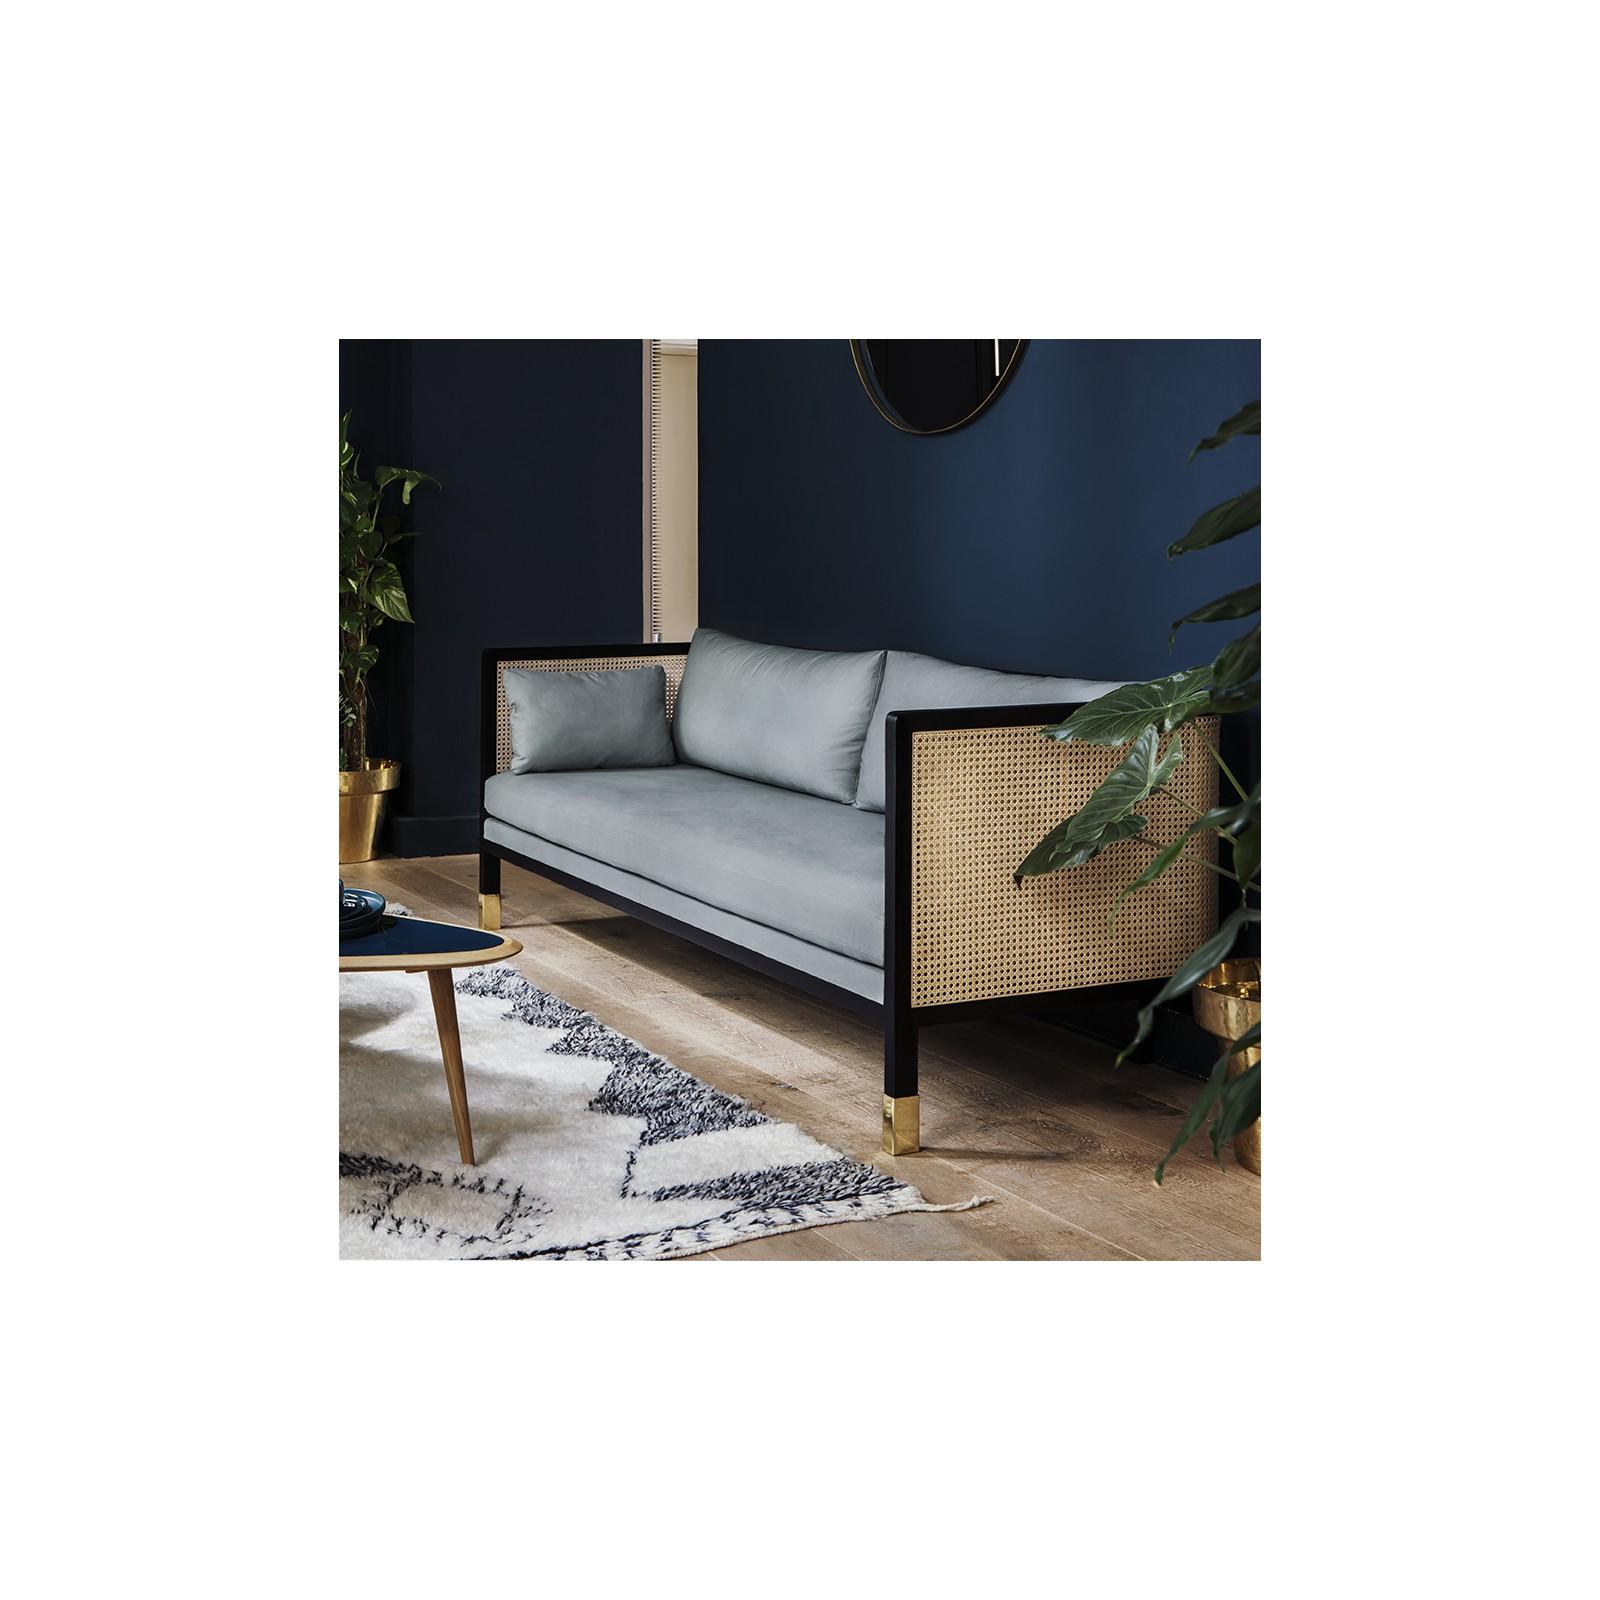 grand canape angle tissu royal sofa id e de canap et. Black Bedroom Furniture Sets. Home Design Ideas